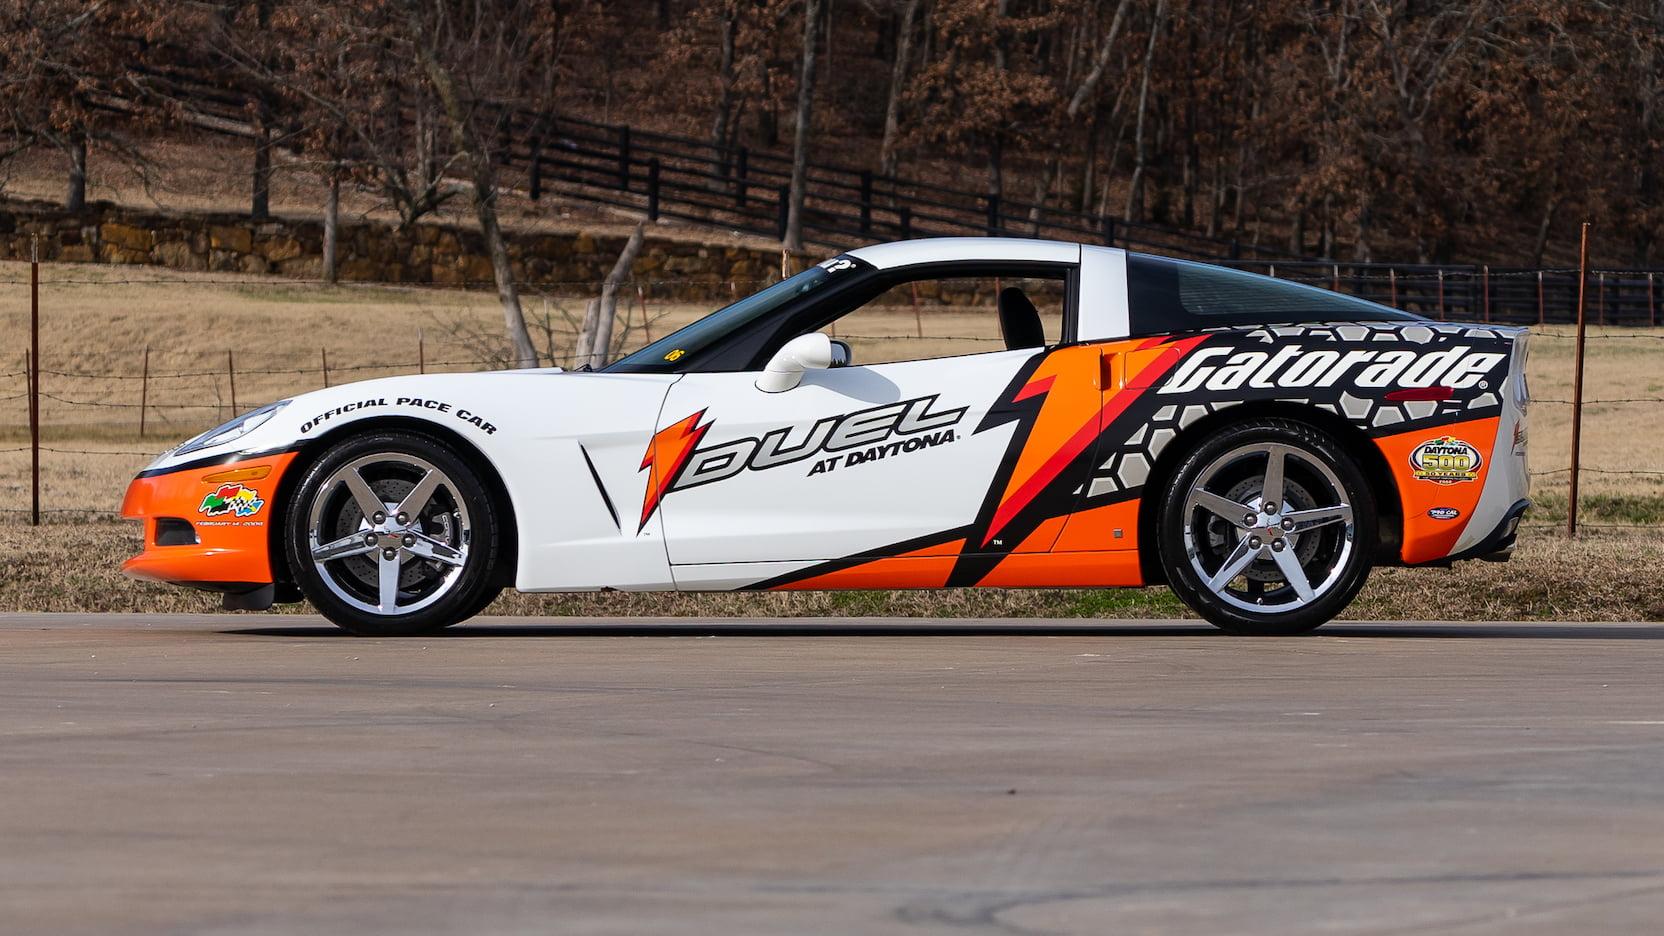 Gatorade 2008 Chevrolet Corvette Daytona Pace Car